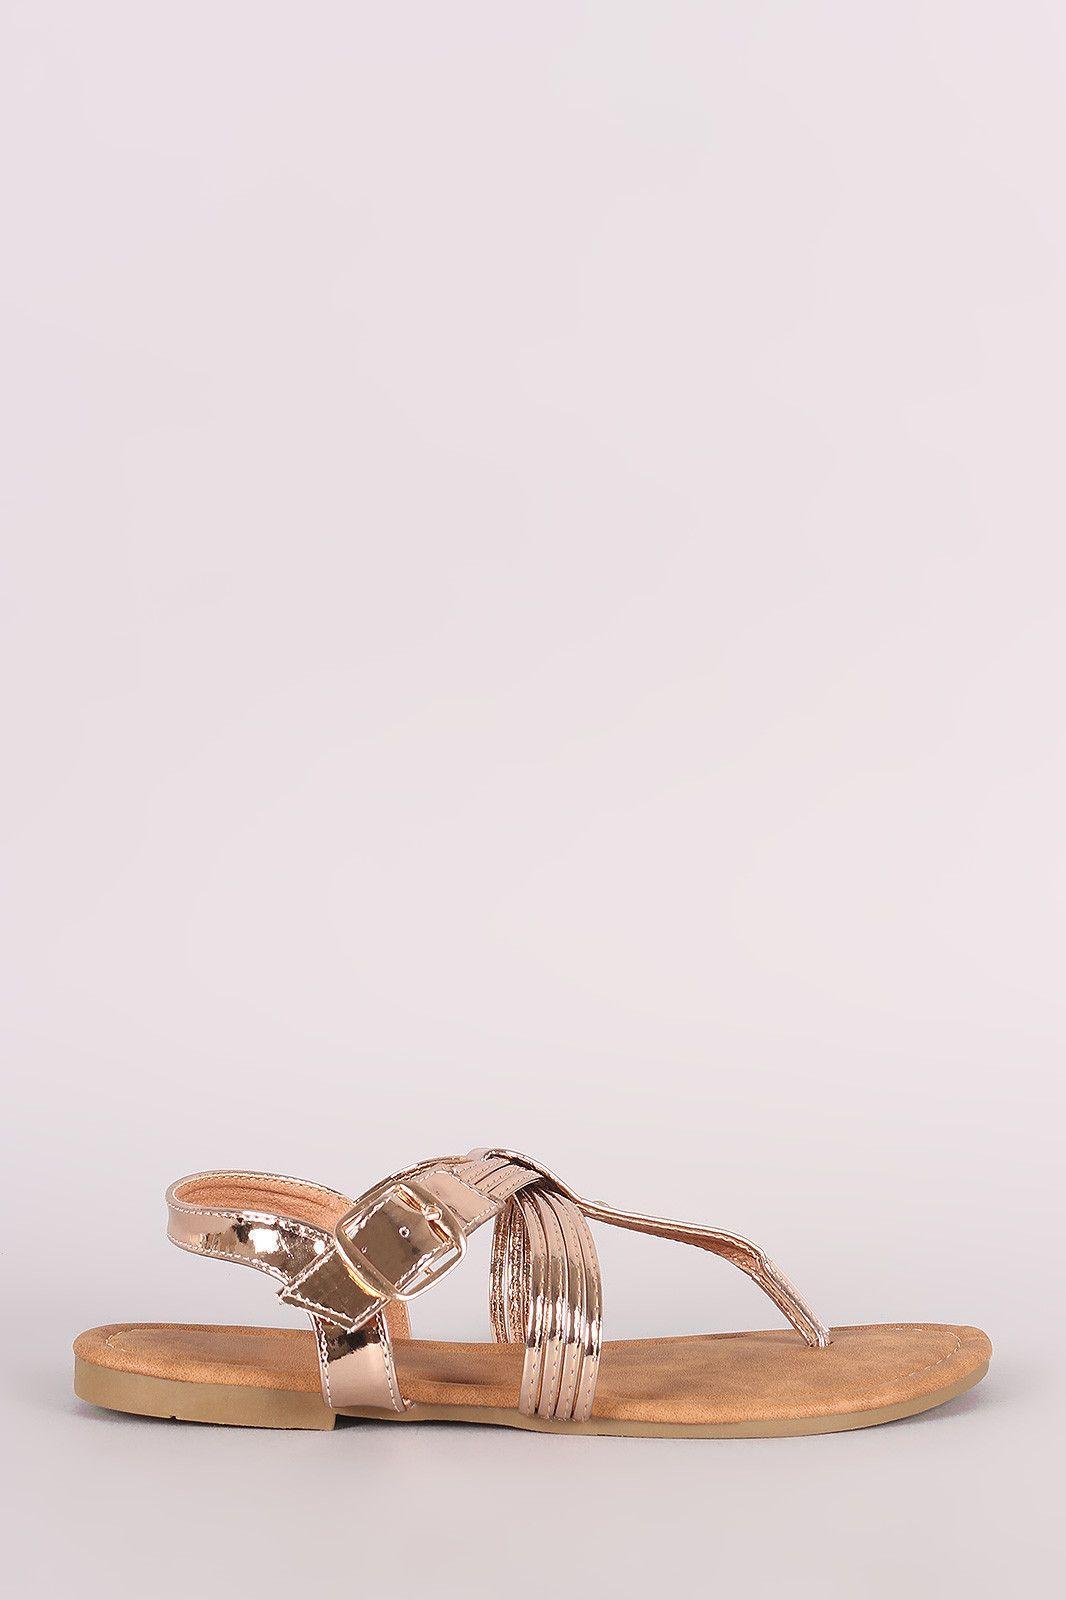 4197cdc84adf Metallic Strappy Crisscross Slingback Thong Flat Sandal